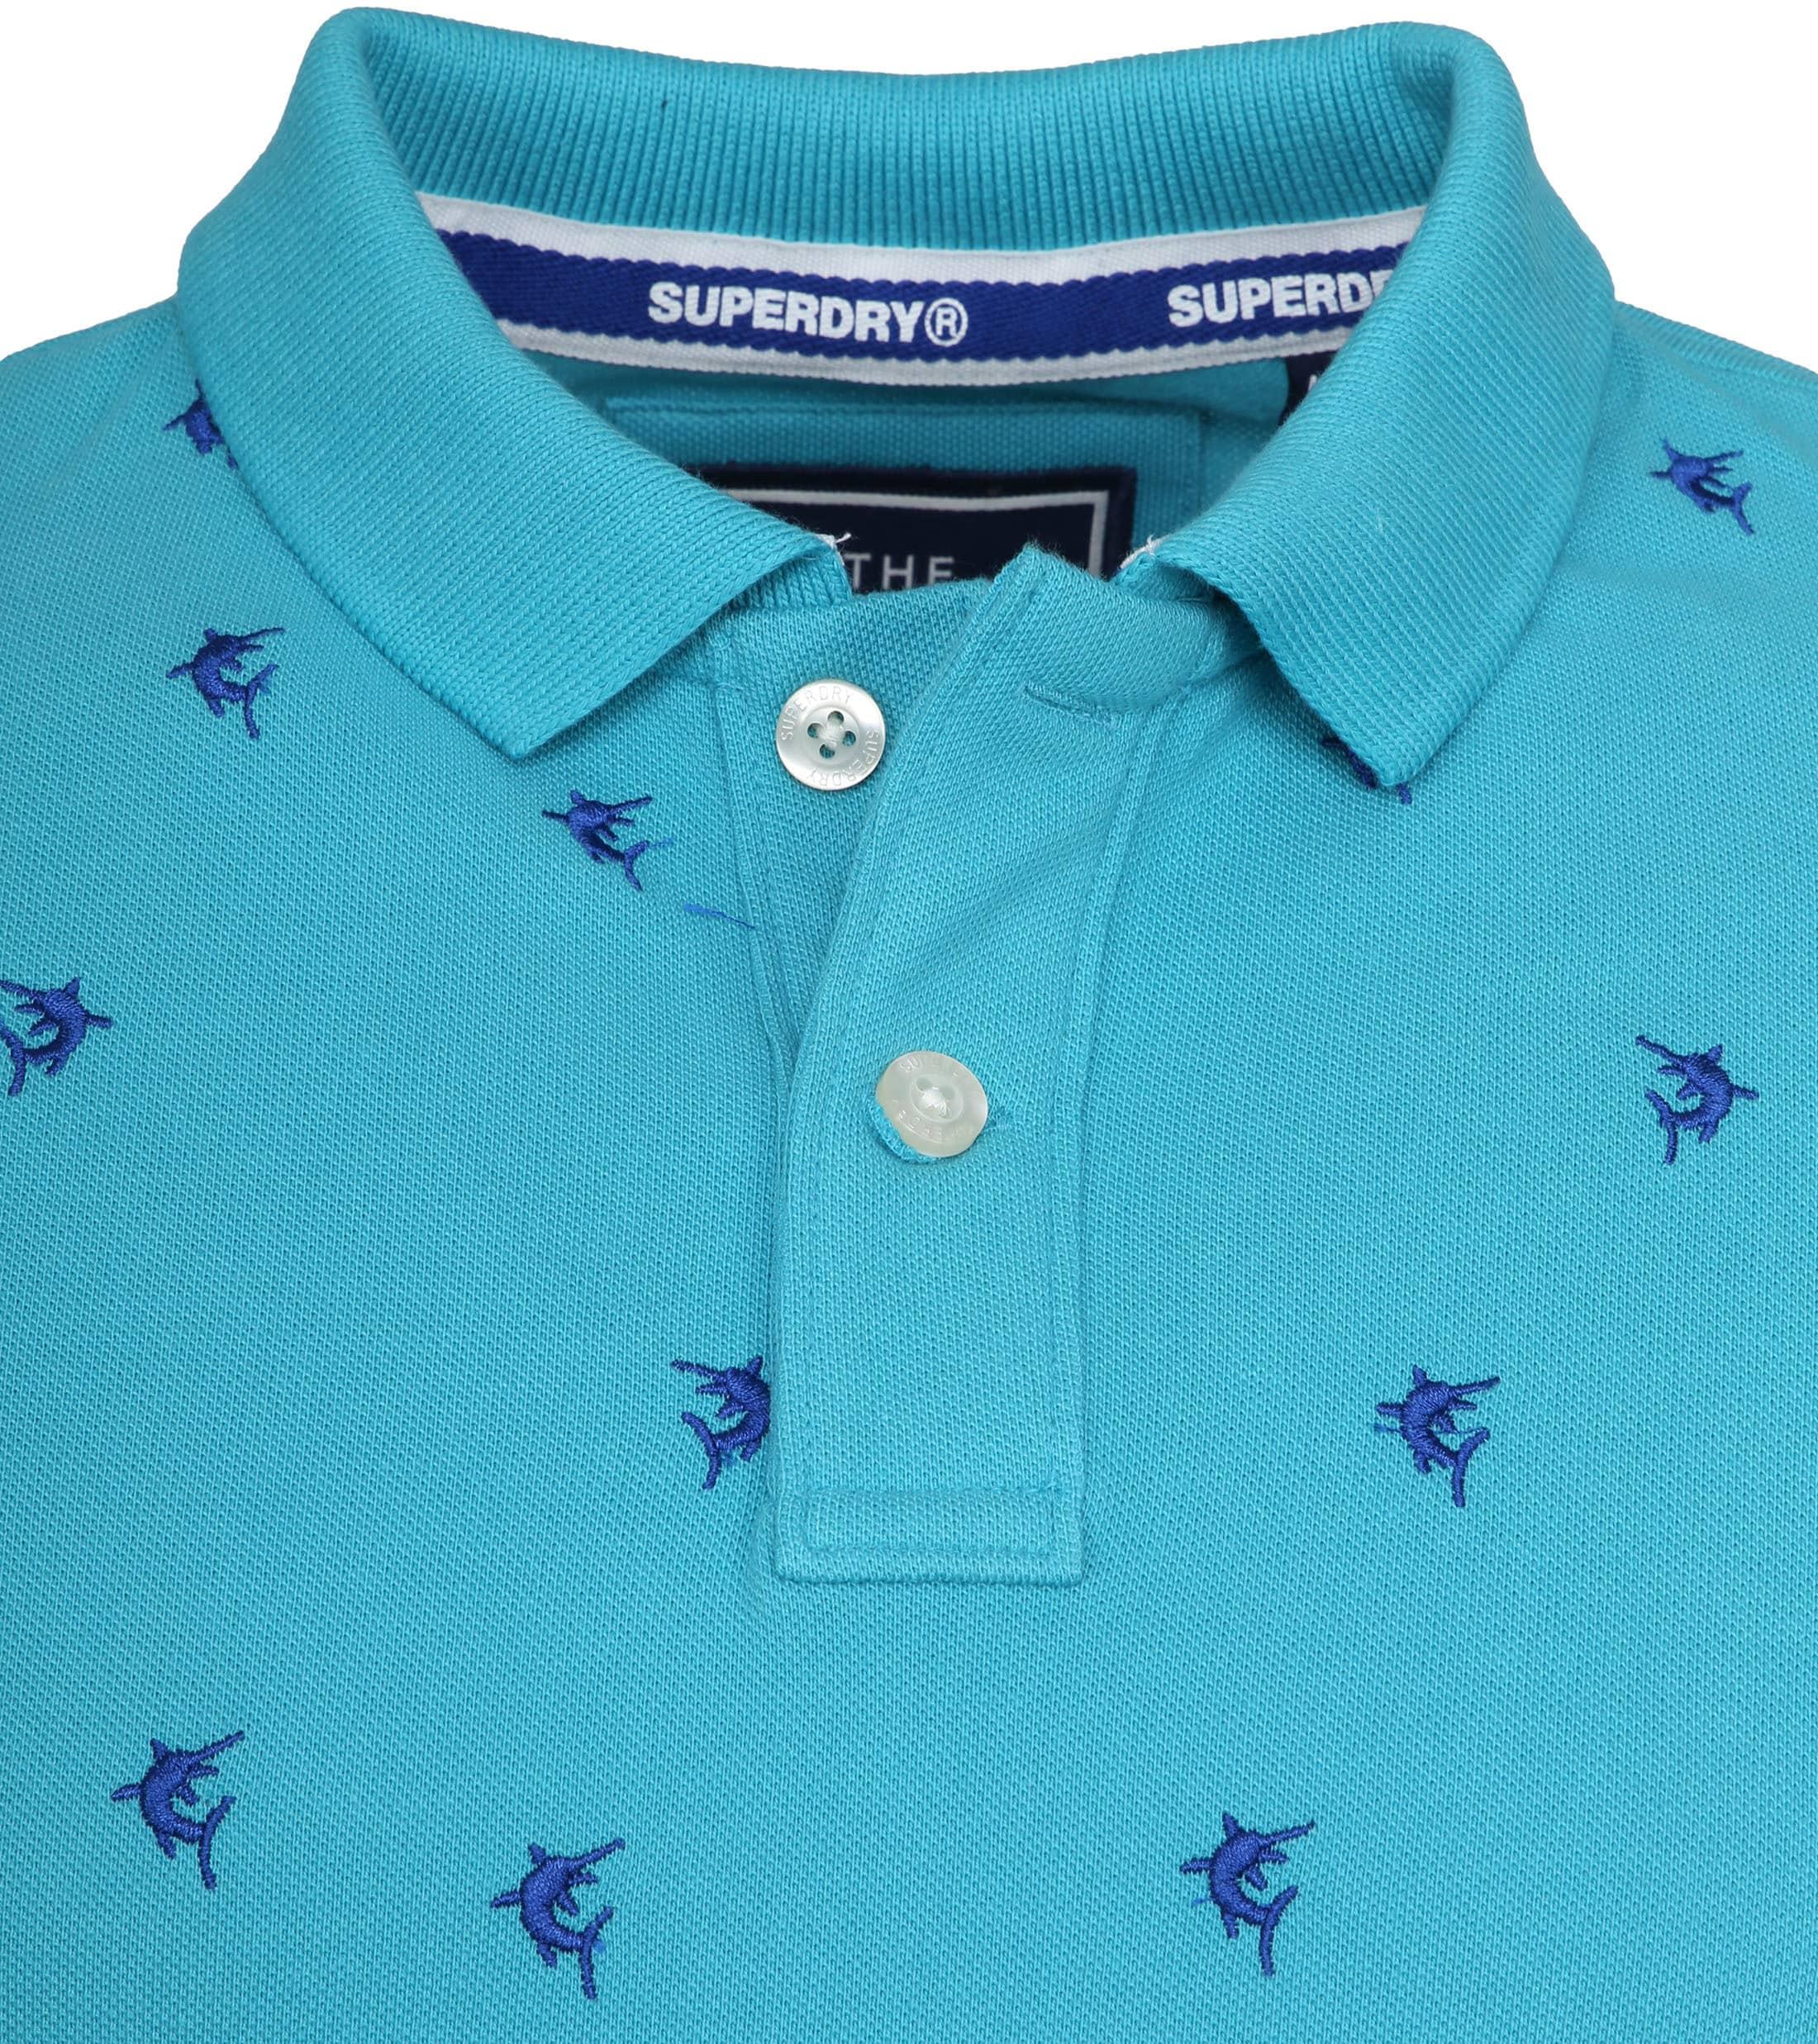 Superdry Poloshirt Bermuda City Turquoise foto 1